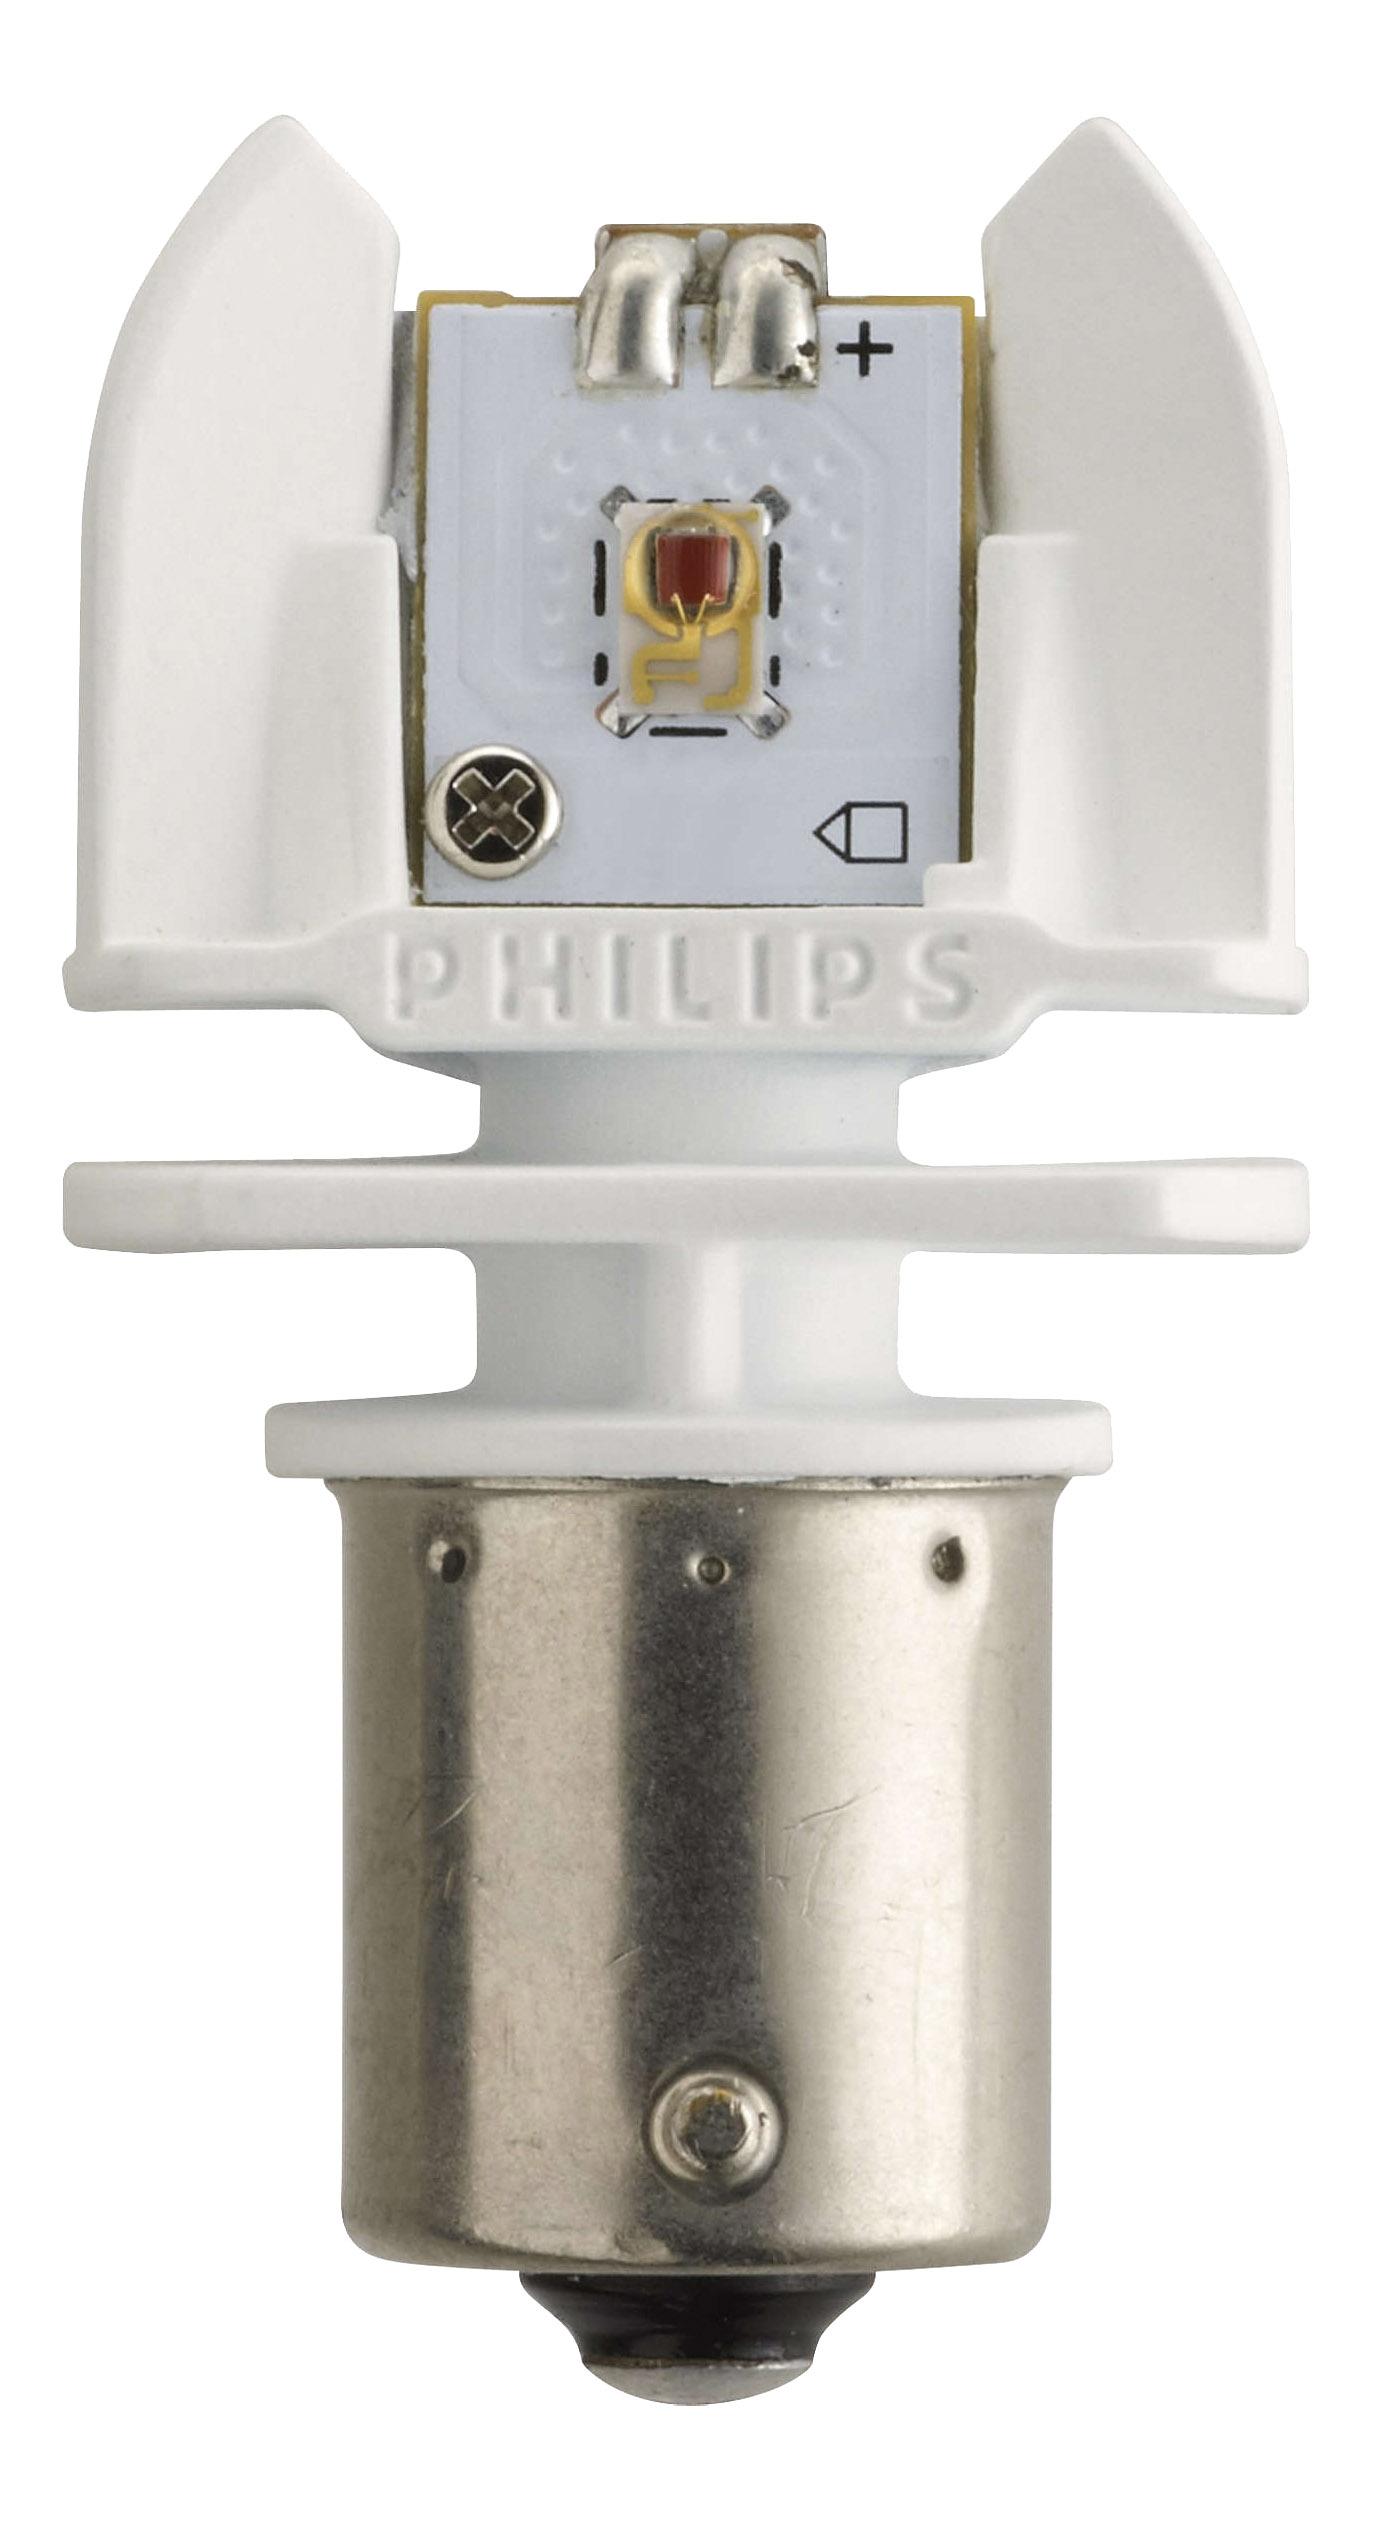 Лампа светодиодная PHILIPS X-tremeUltinon 21W BA15s 12898RX2 фото